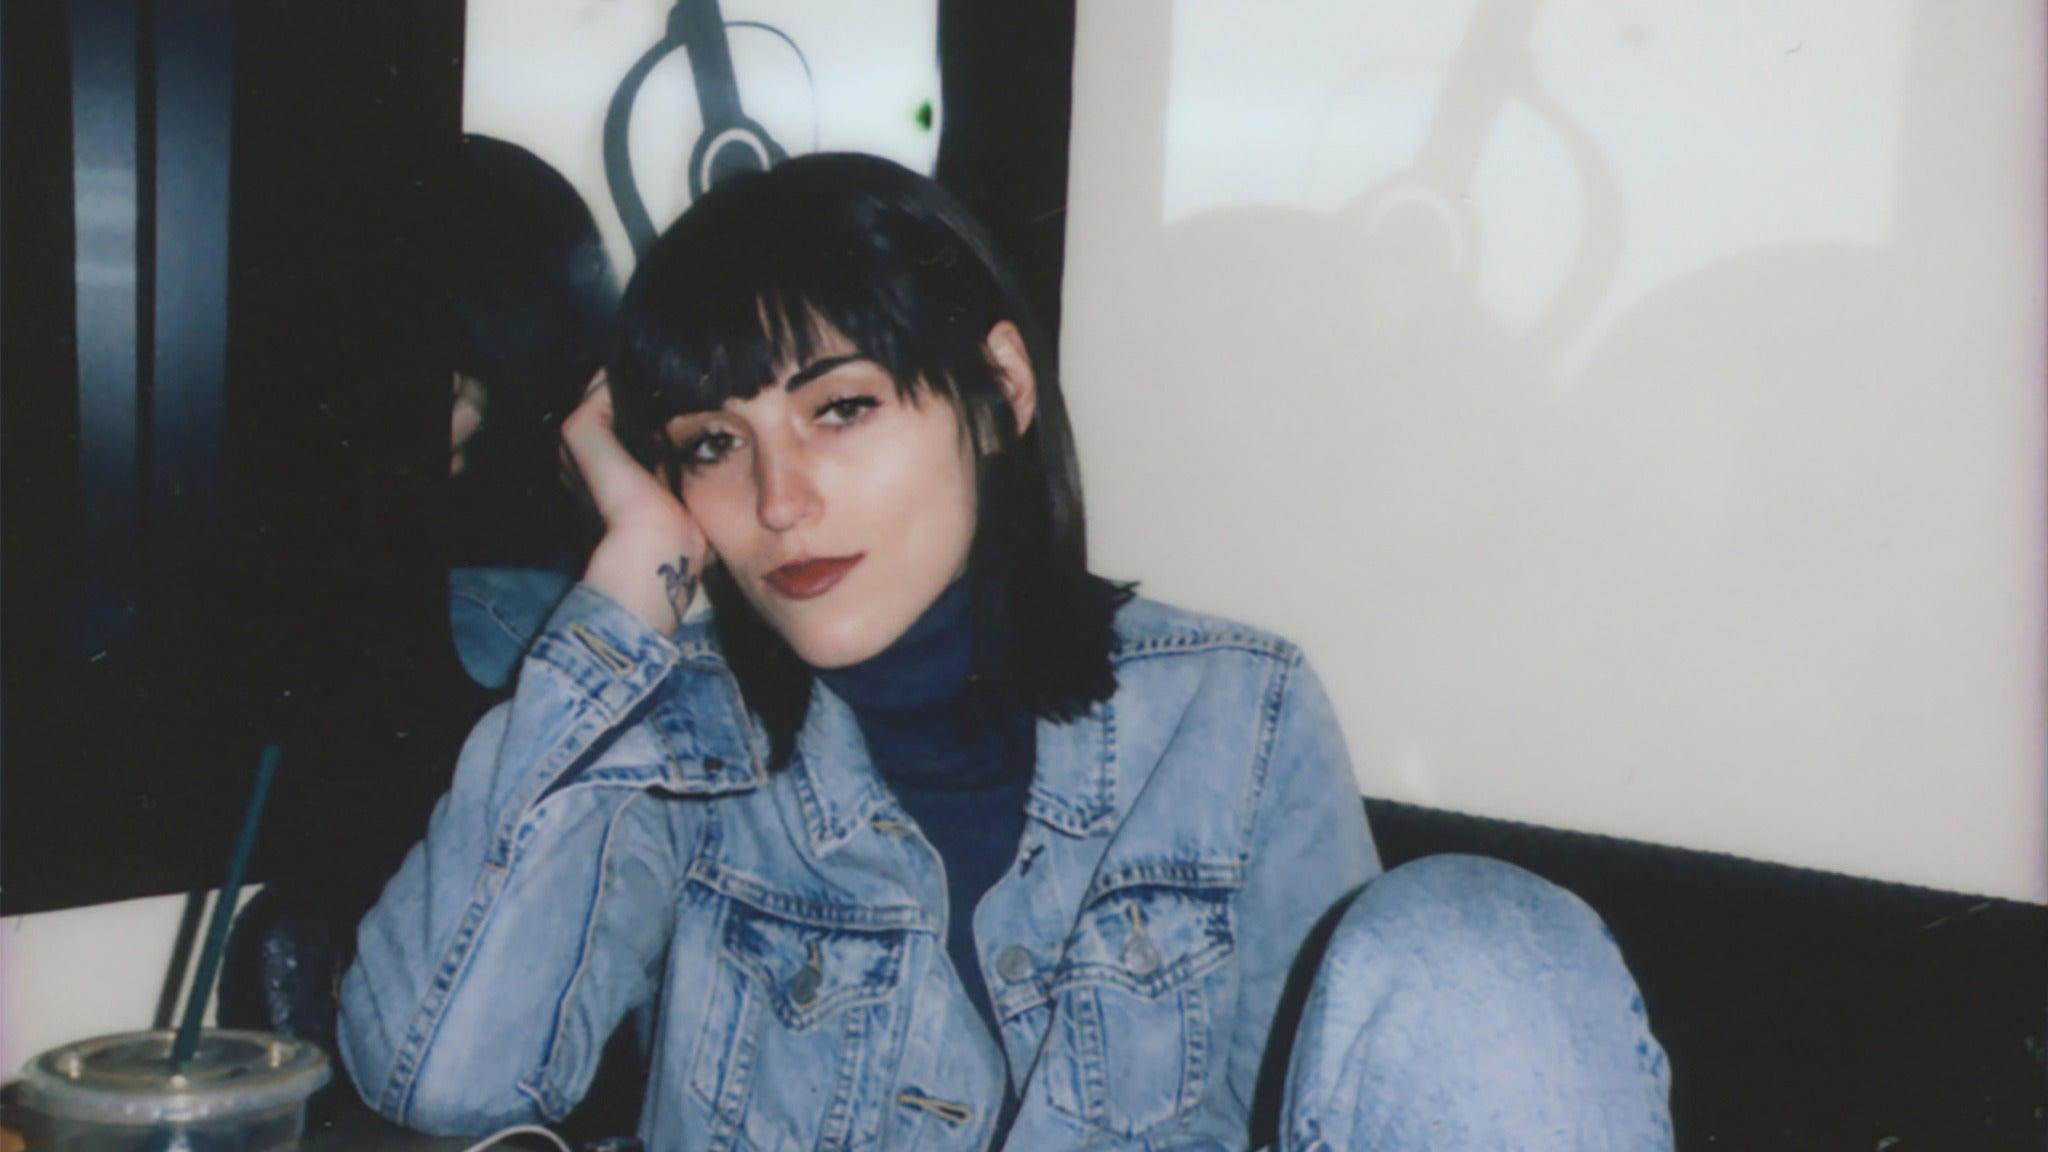 Sasha Sloan at 9:30 Club - Washington, DC 20001